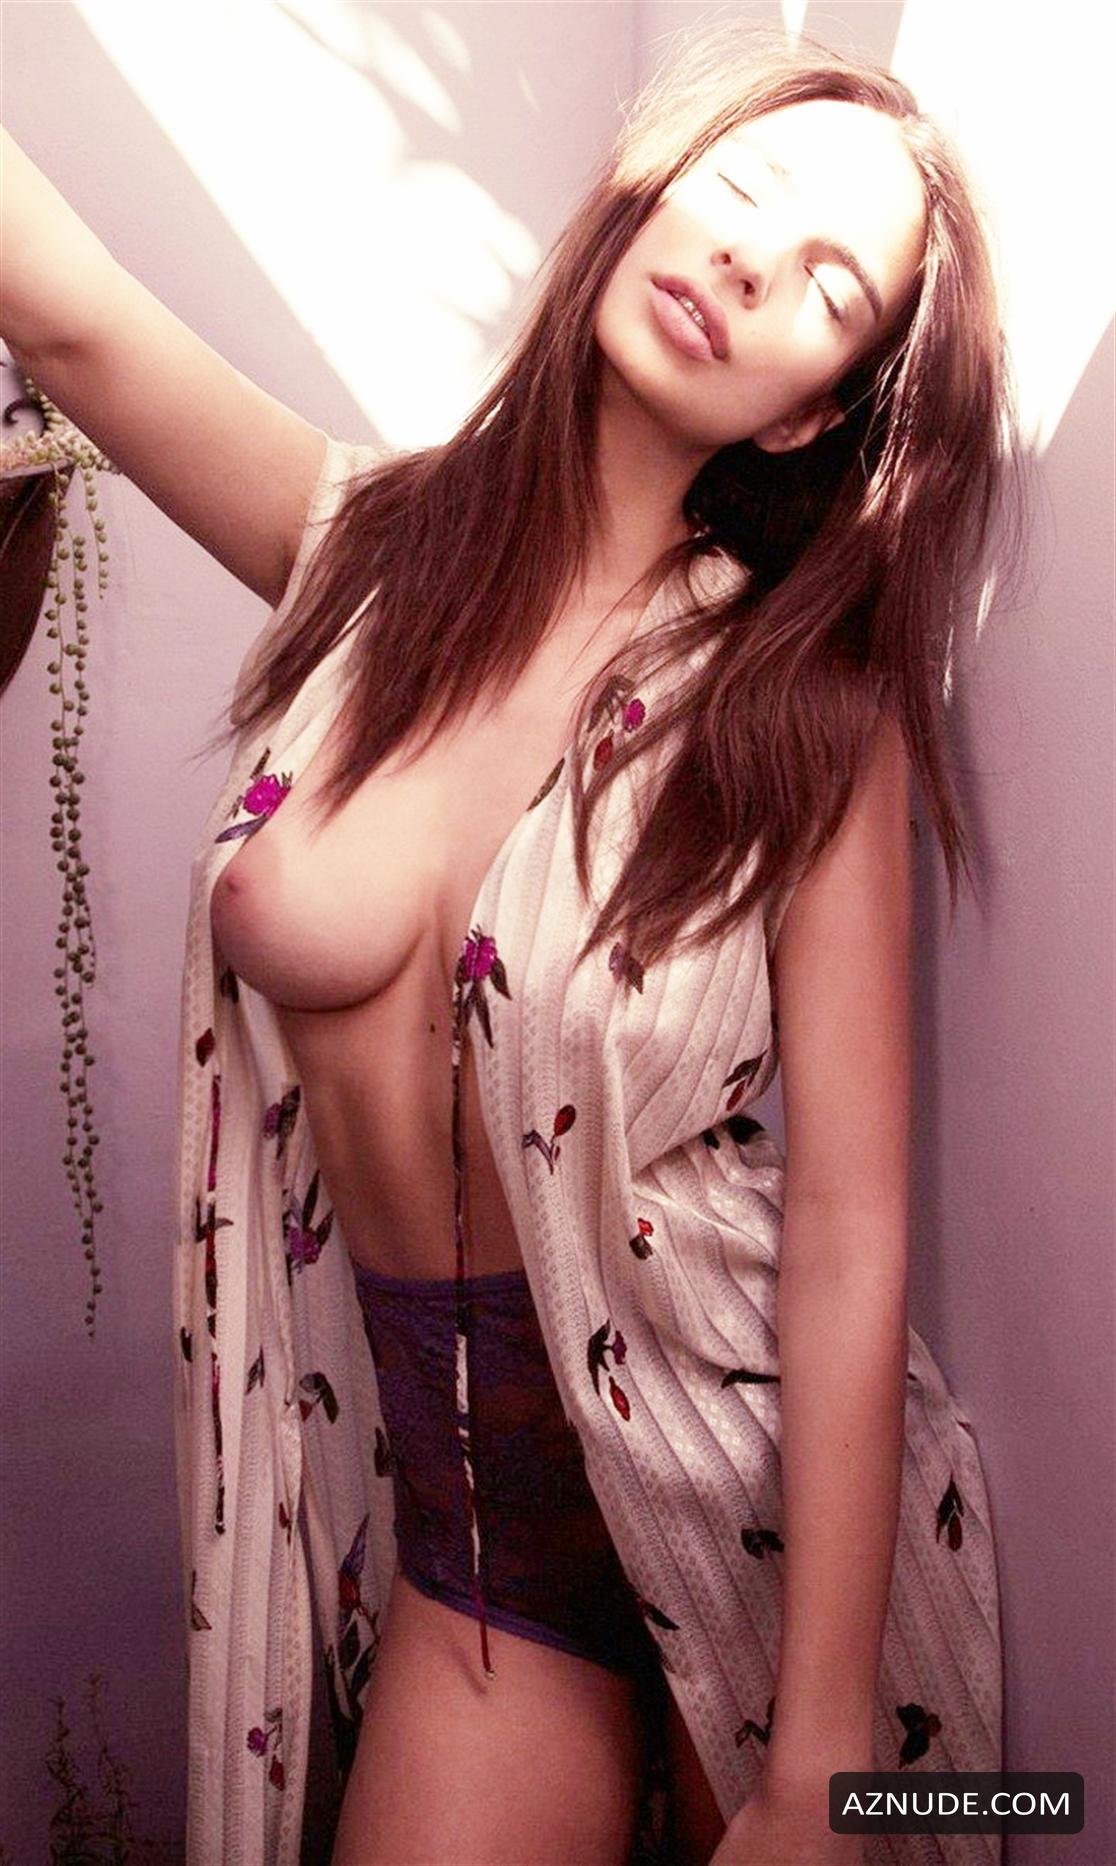 Emily Ratajkowski Nude By Olivia Malone - Aznude-1972